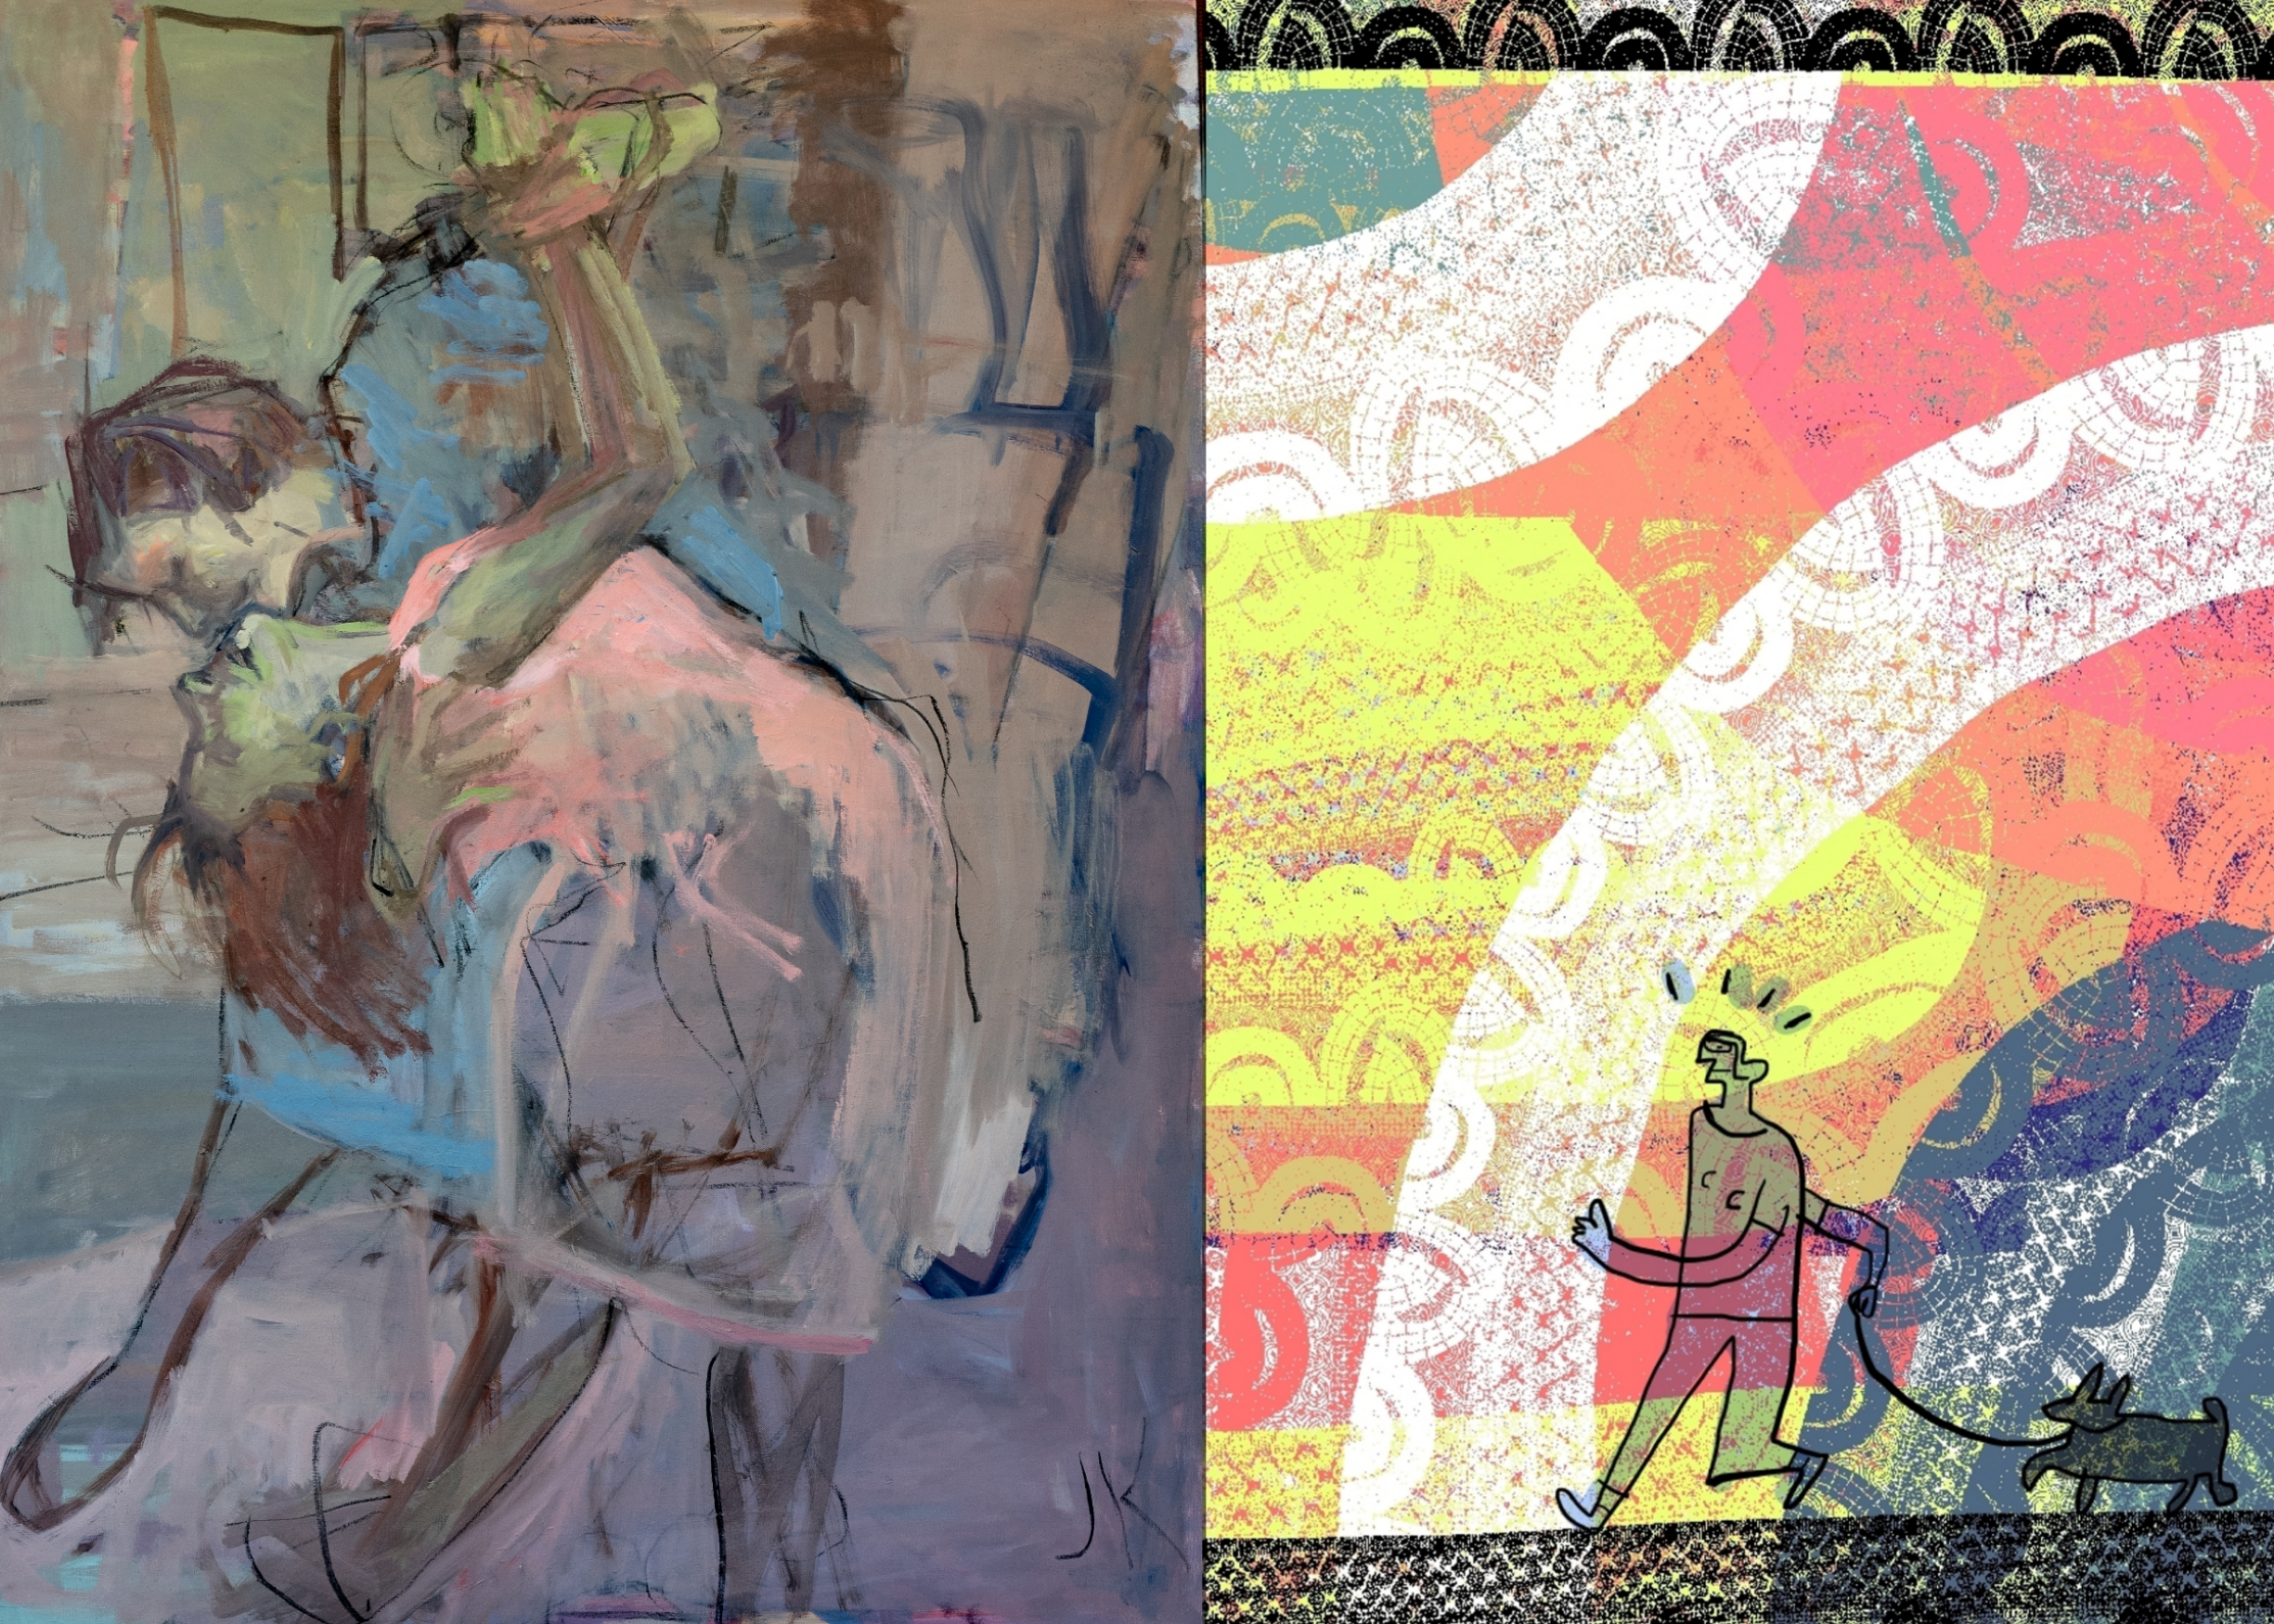 Seredipity - Joanie Krug & Kim Murton